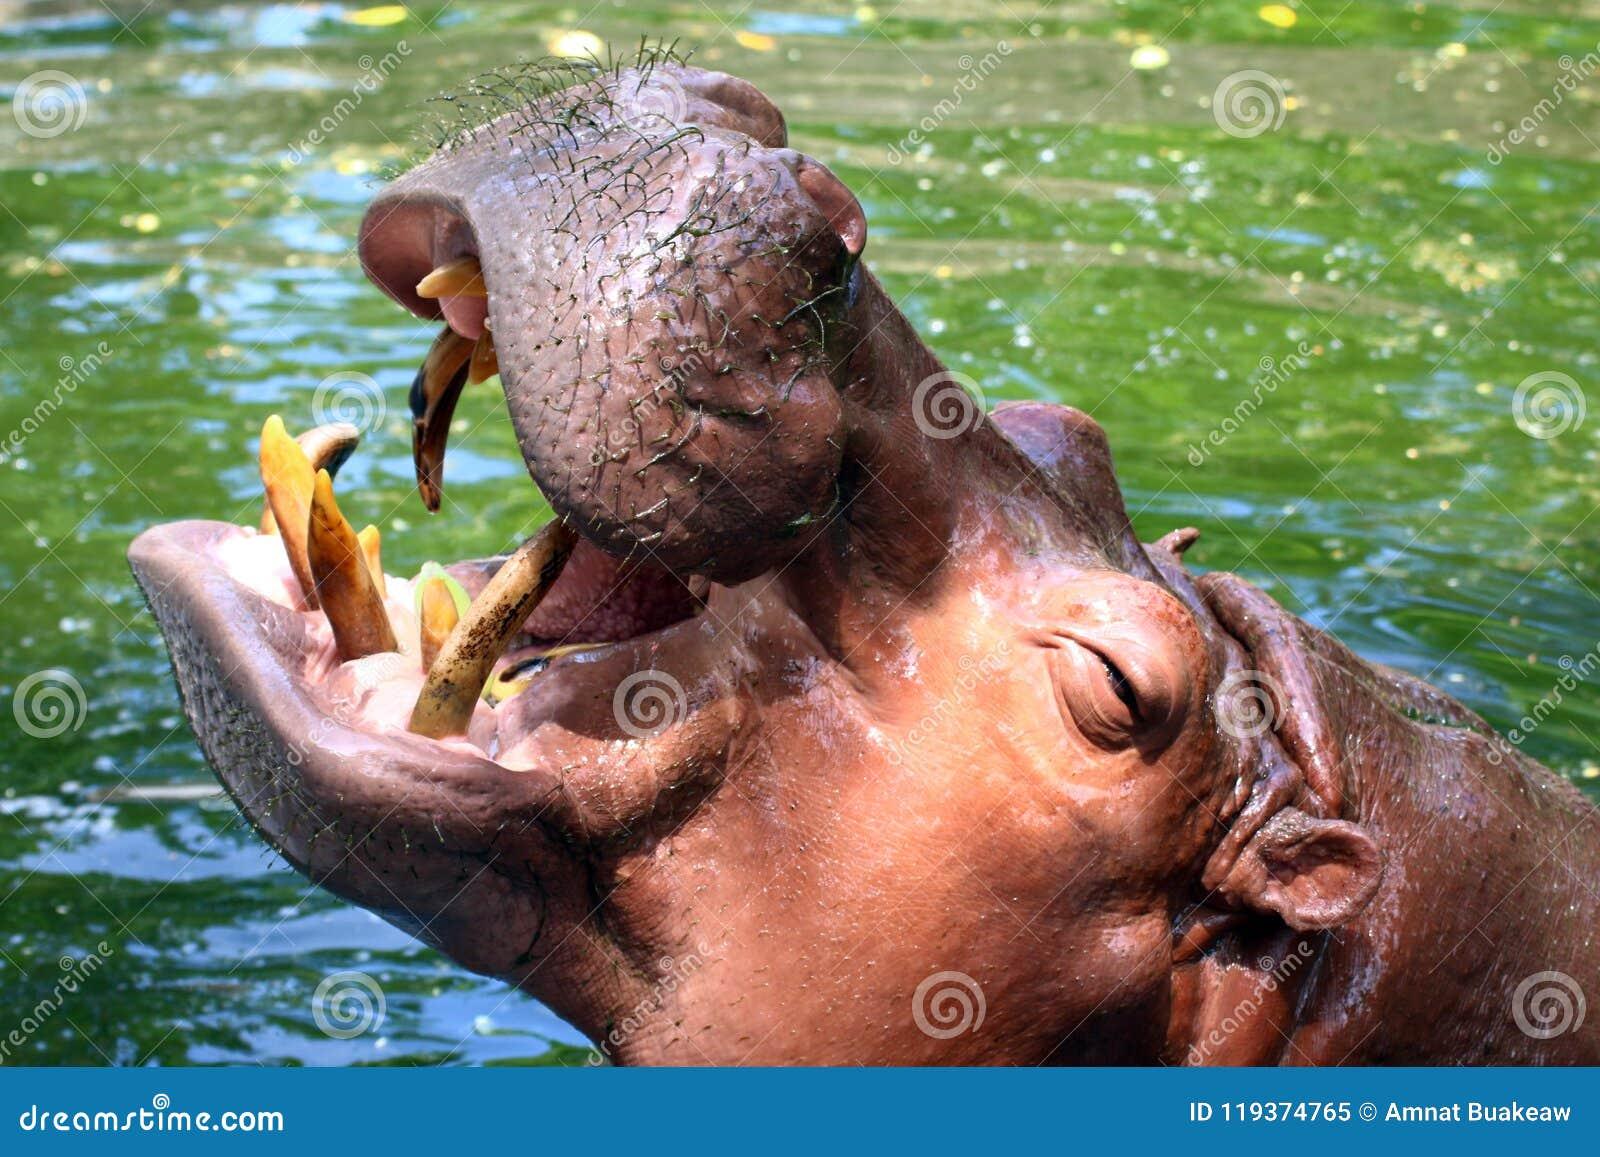 Hippo, ανοικτό στόμα Hippopotamus, Hippopotamus στενό σε επάνω νερού